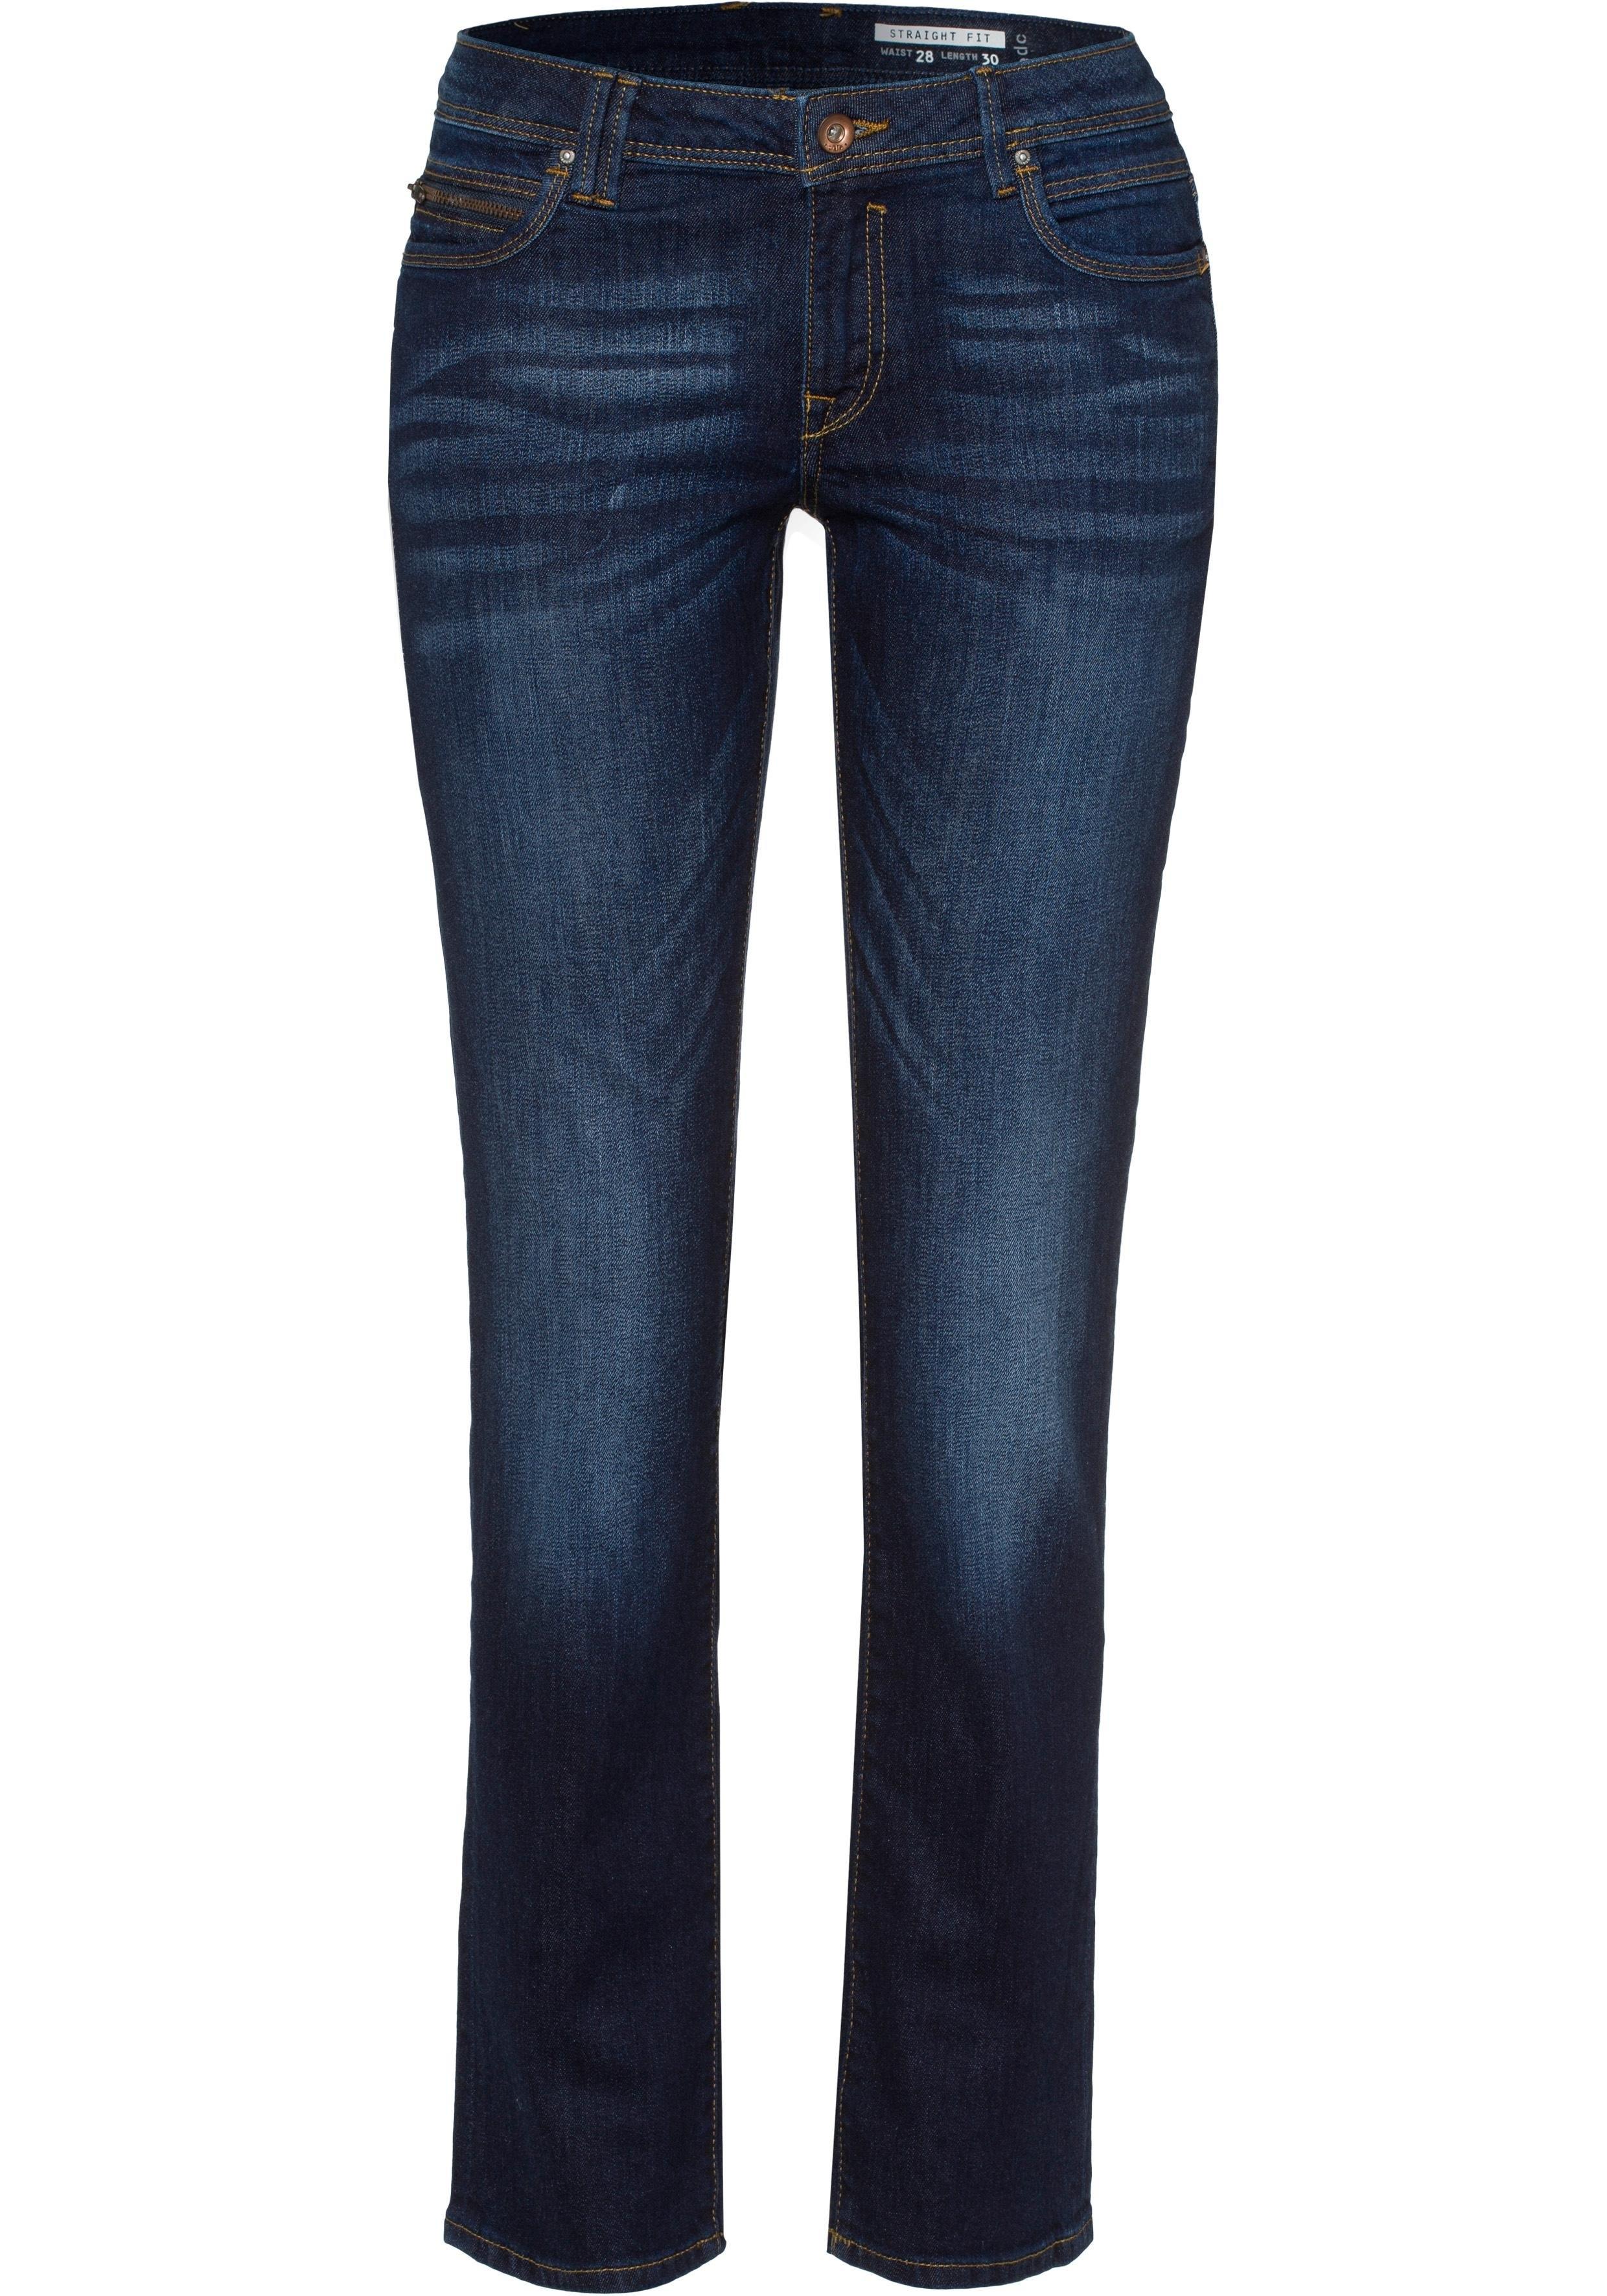 edc by esprit straight jeans goedkoop op otto.nl kopen